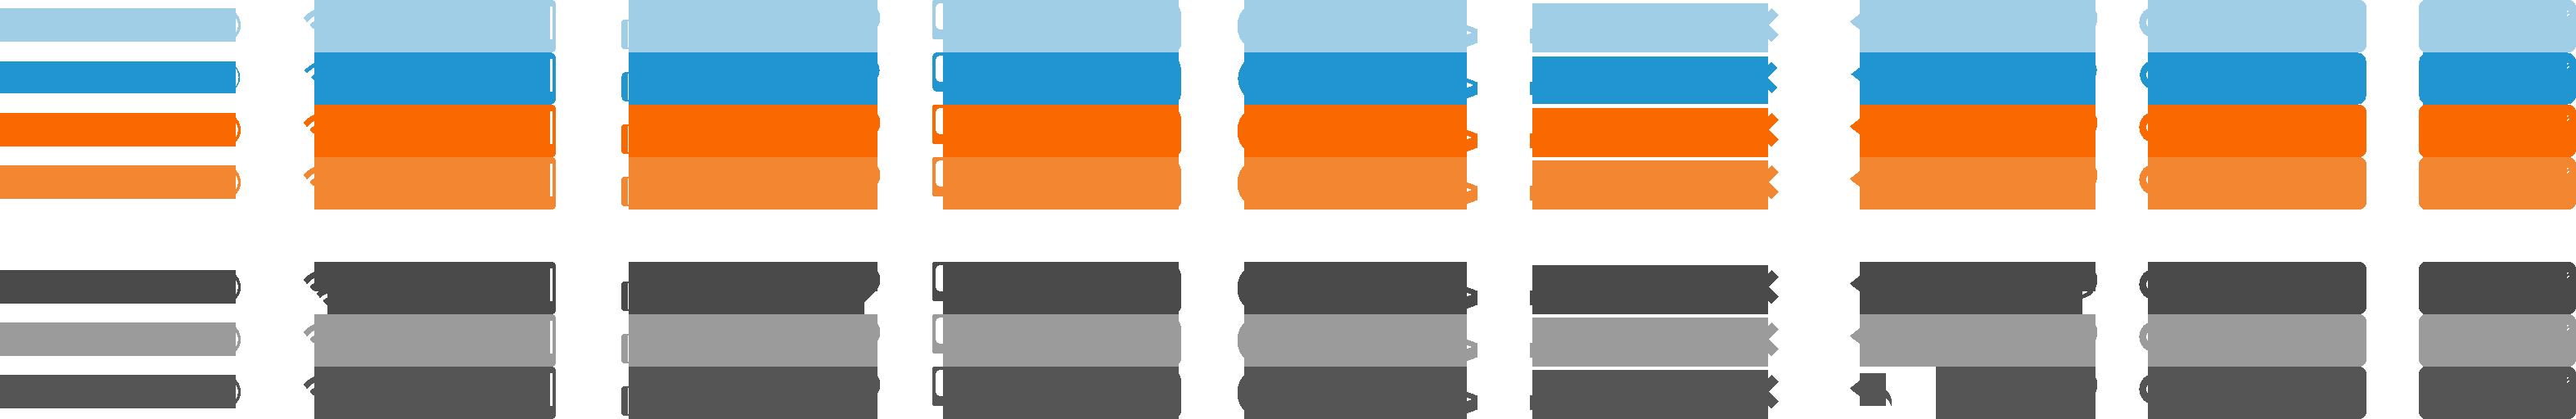 Creating CSS Sprites using SASS